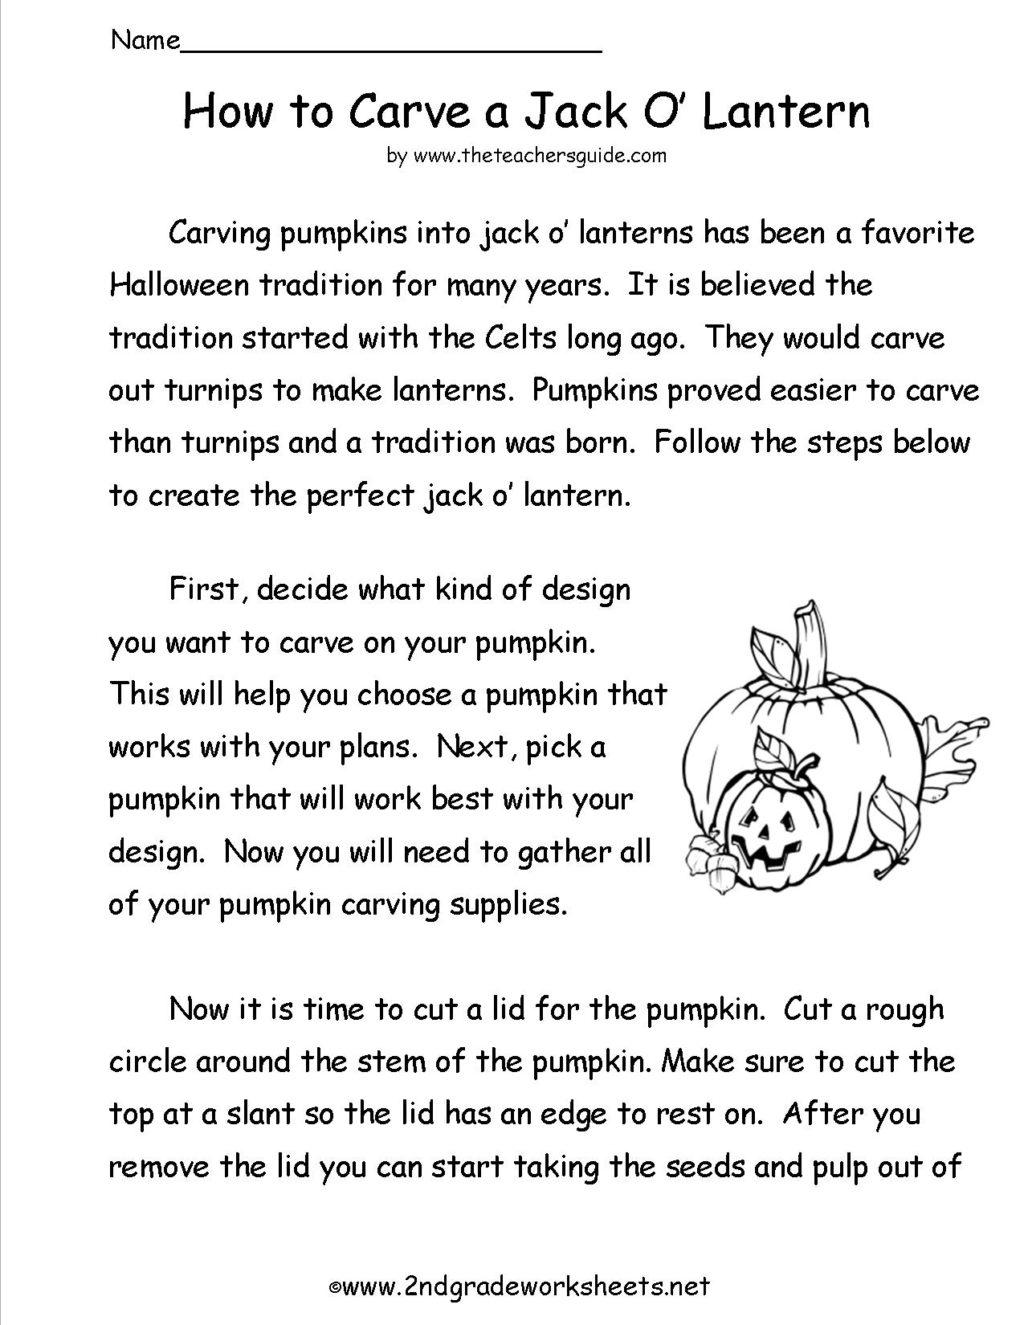 Free Printable 2nd Grade Halloween Worksheets